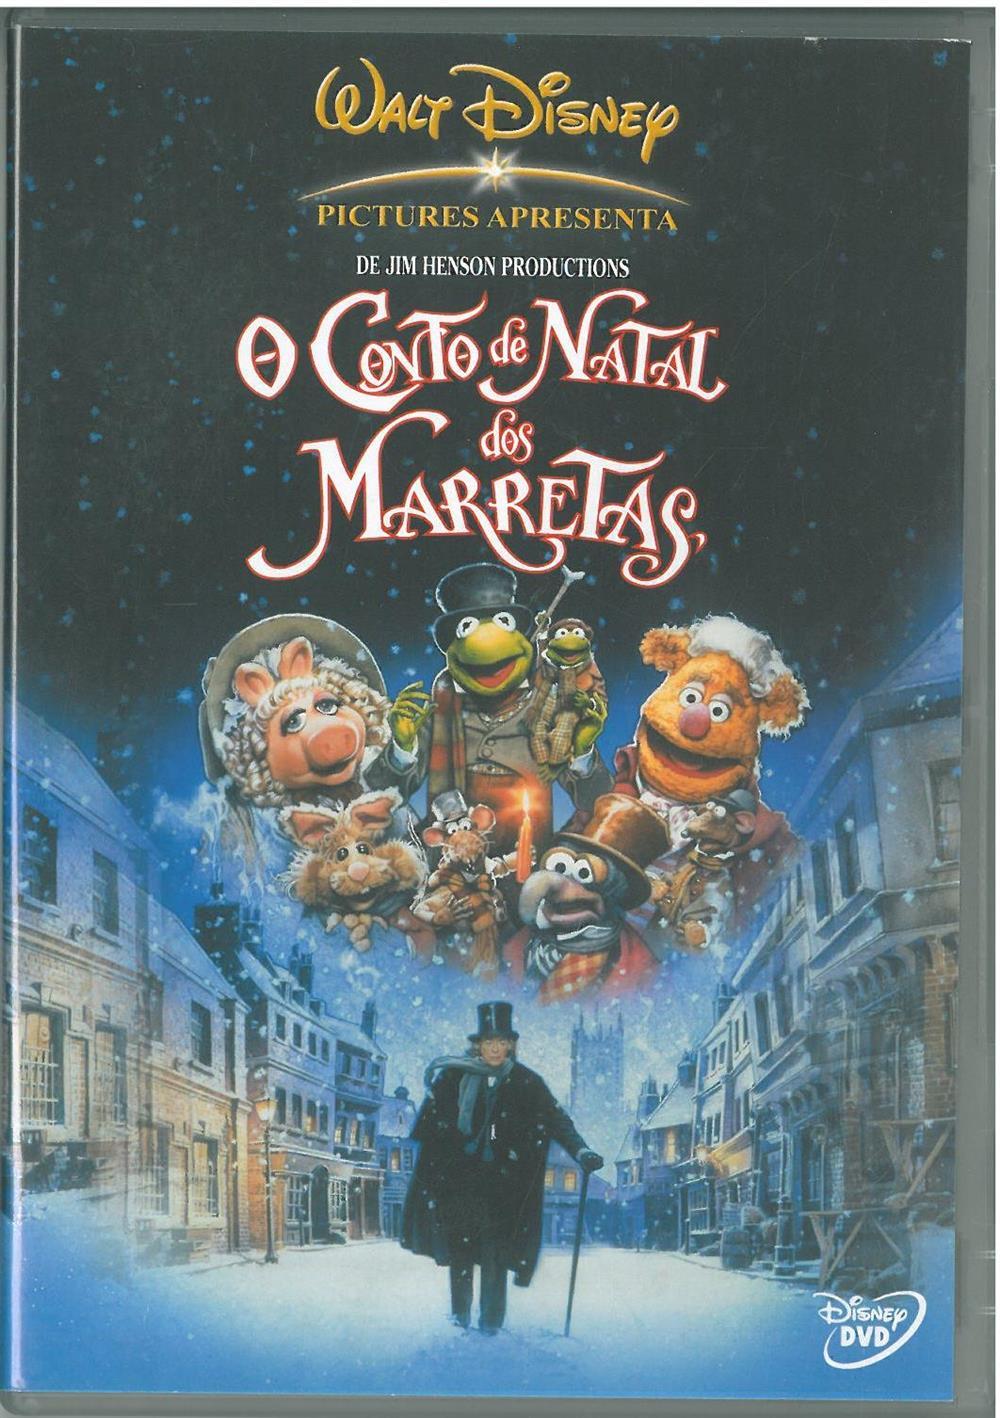 O conto de Natal dos Marretas_DVD.jpg